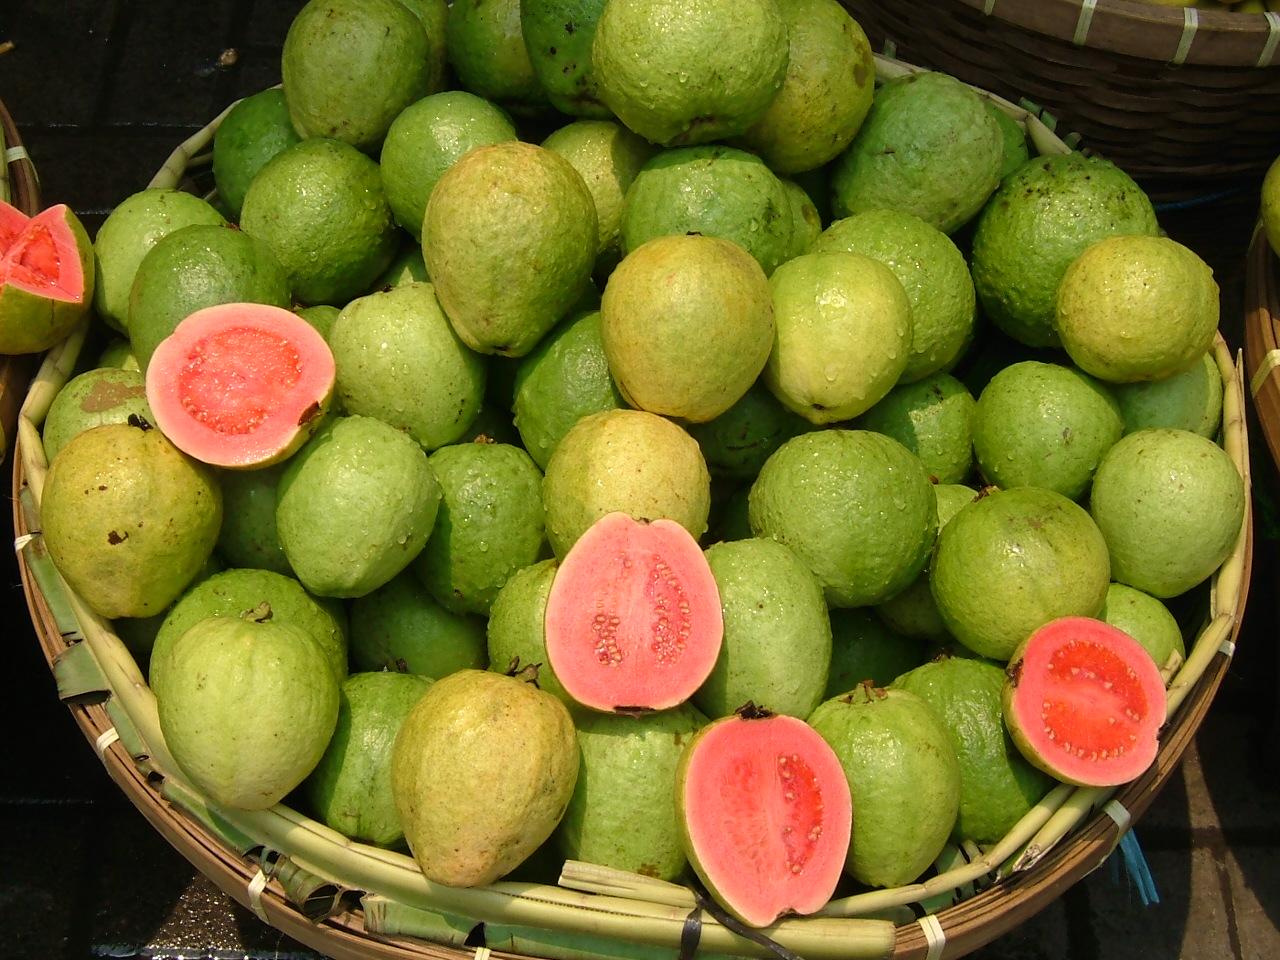 Basket of Guava